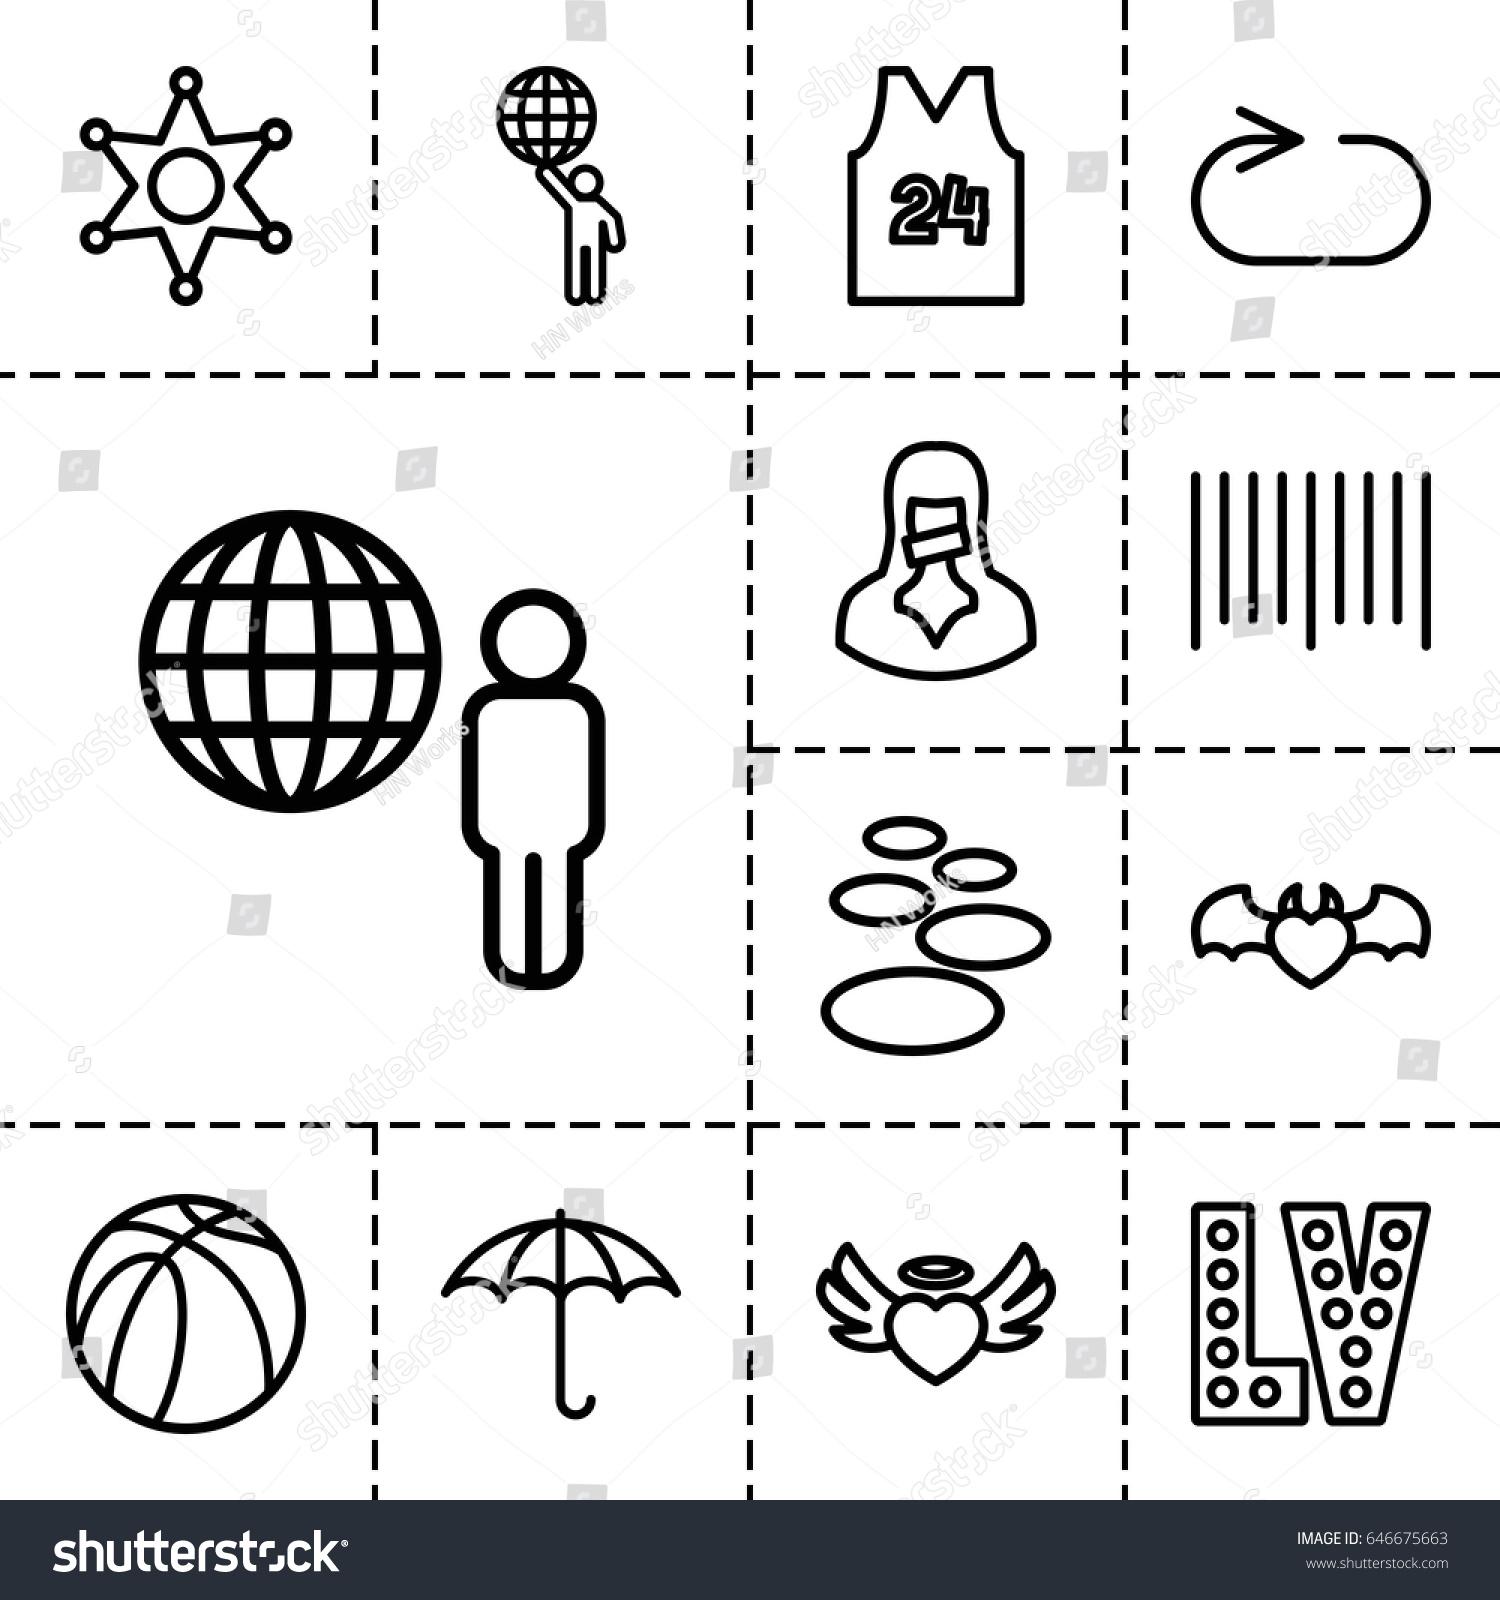 Grunge icon set 13 outline grunge stock vector 646675663 grunge icon set of 13 outline grunge icons such as vegas basketball keep buycottarizona Choice Image